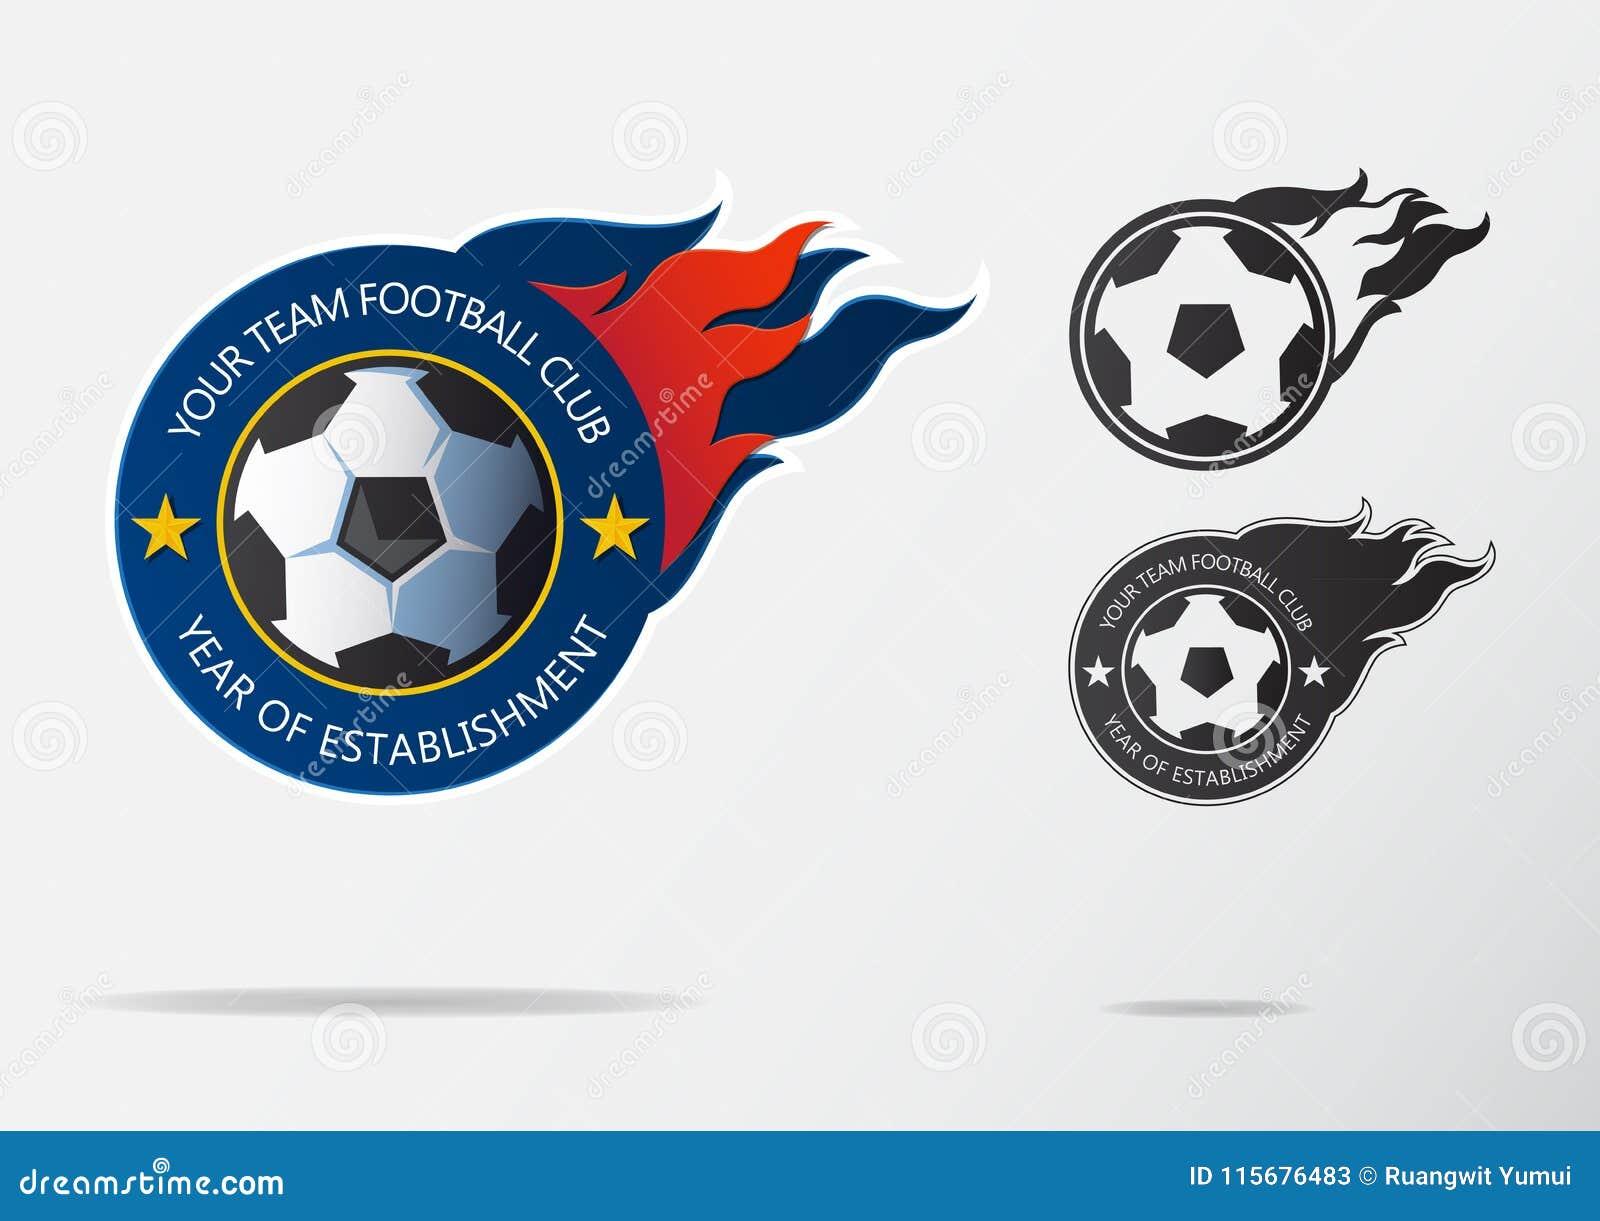 Soccer logo or football badge template design for football team soccer logo or football badge template design for football team sport emblem of black and maxwellsz